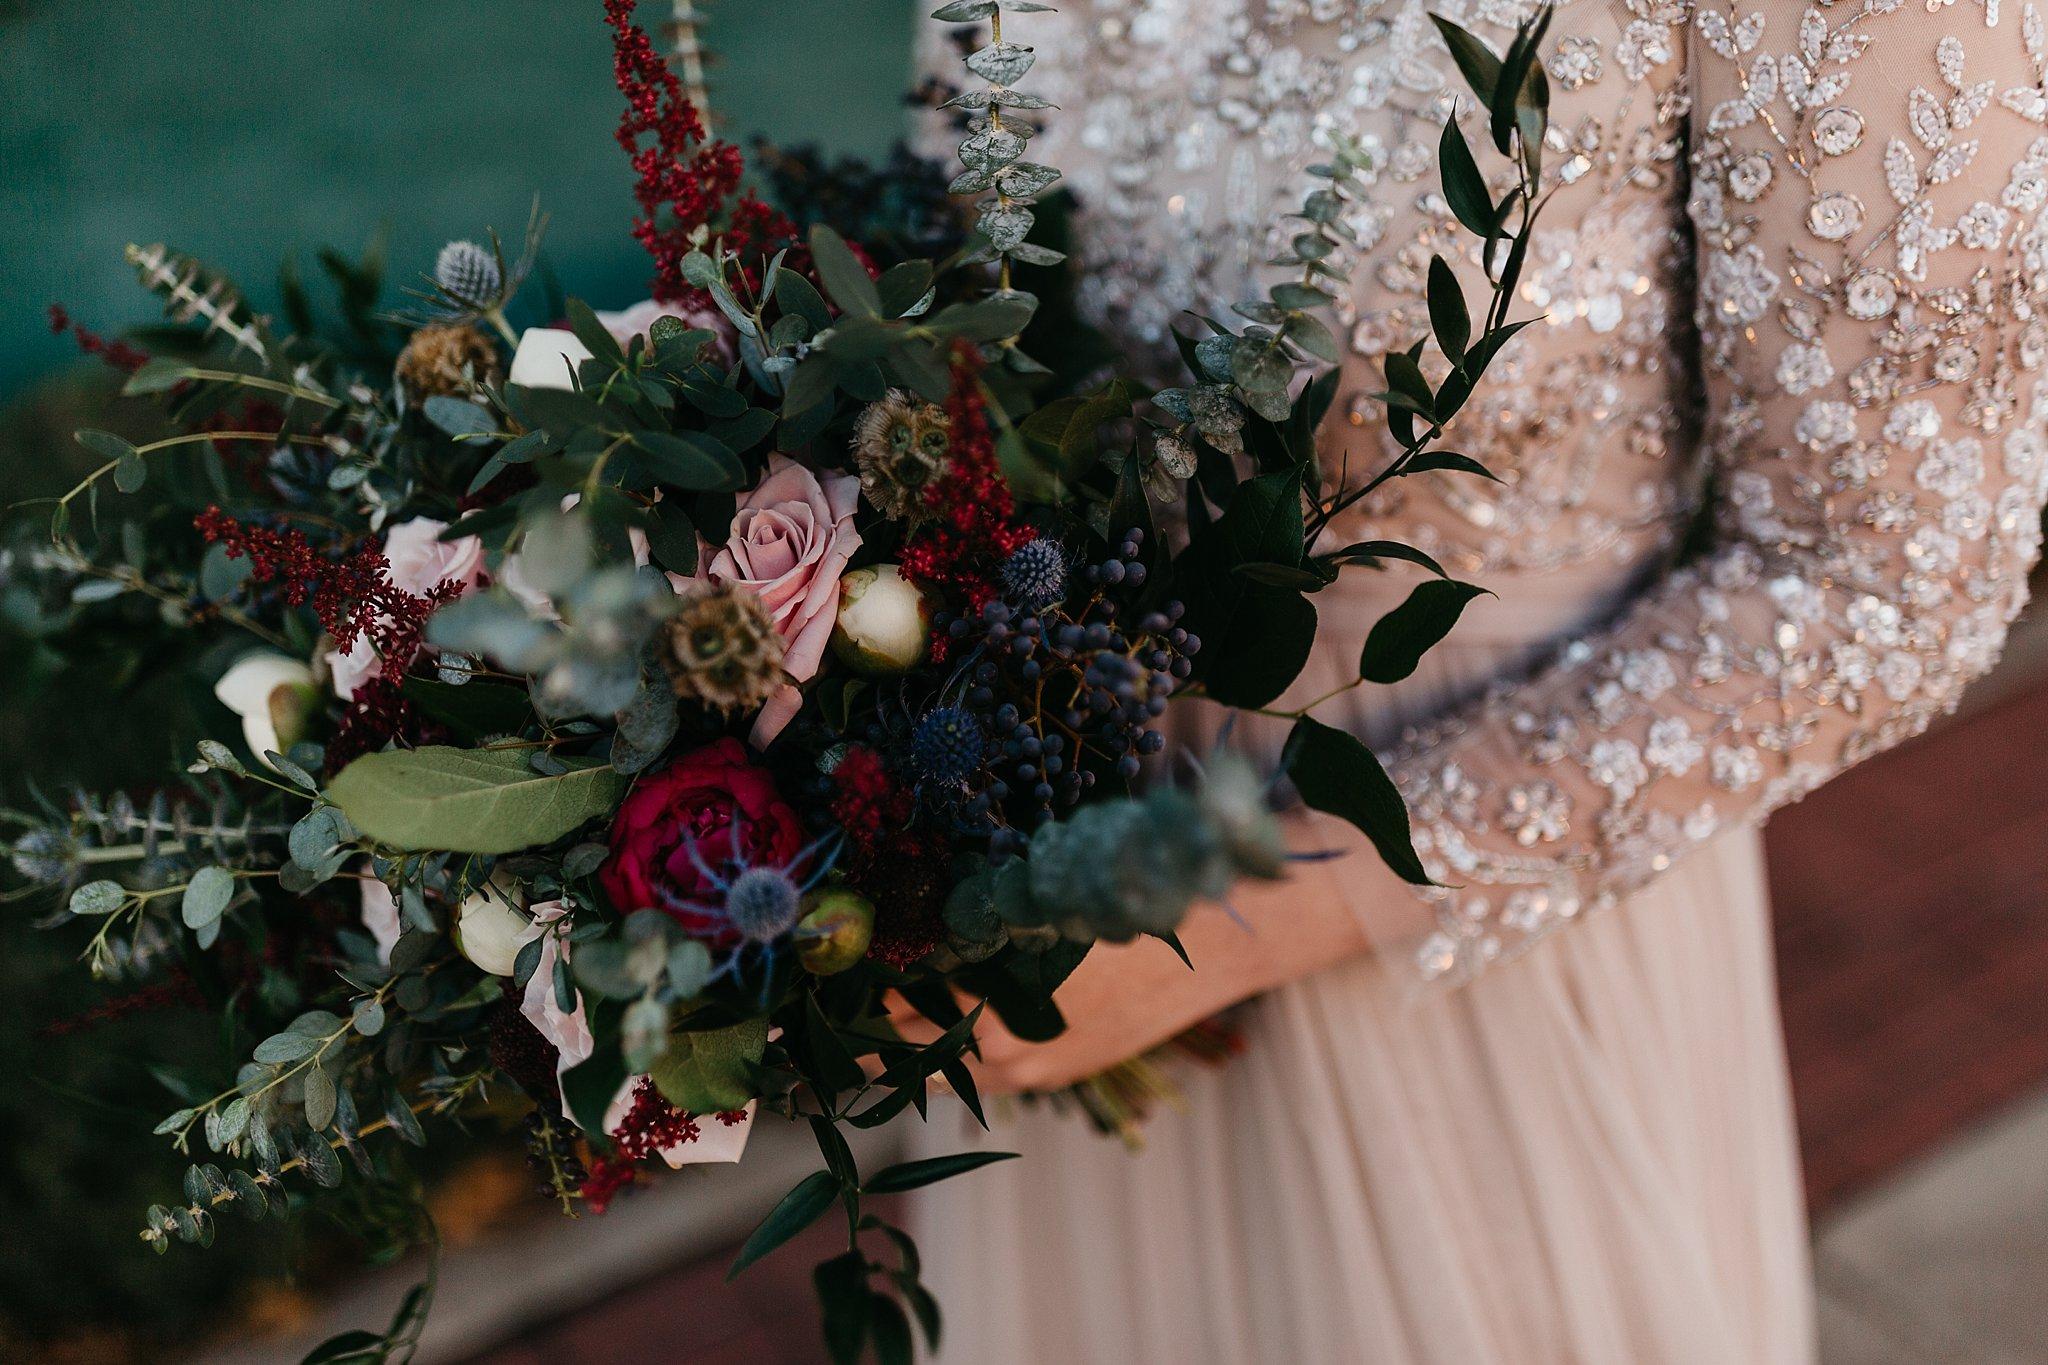 Wilderlove Co_Waco Texas_The Phoenix_Romantic Wedding Photography_0045.jpg